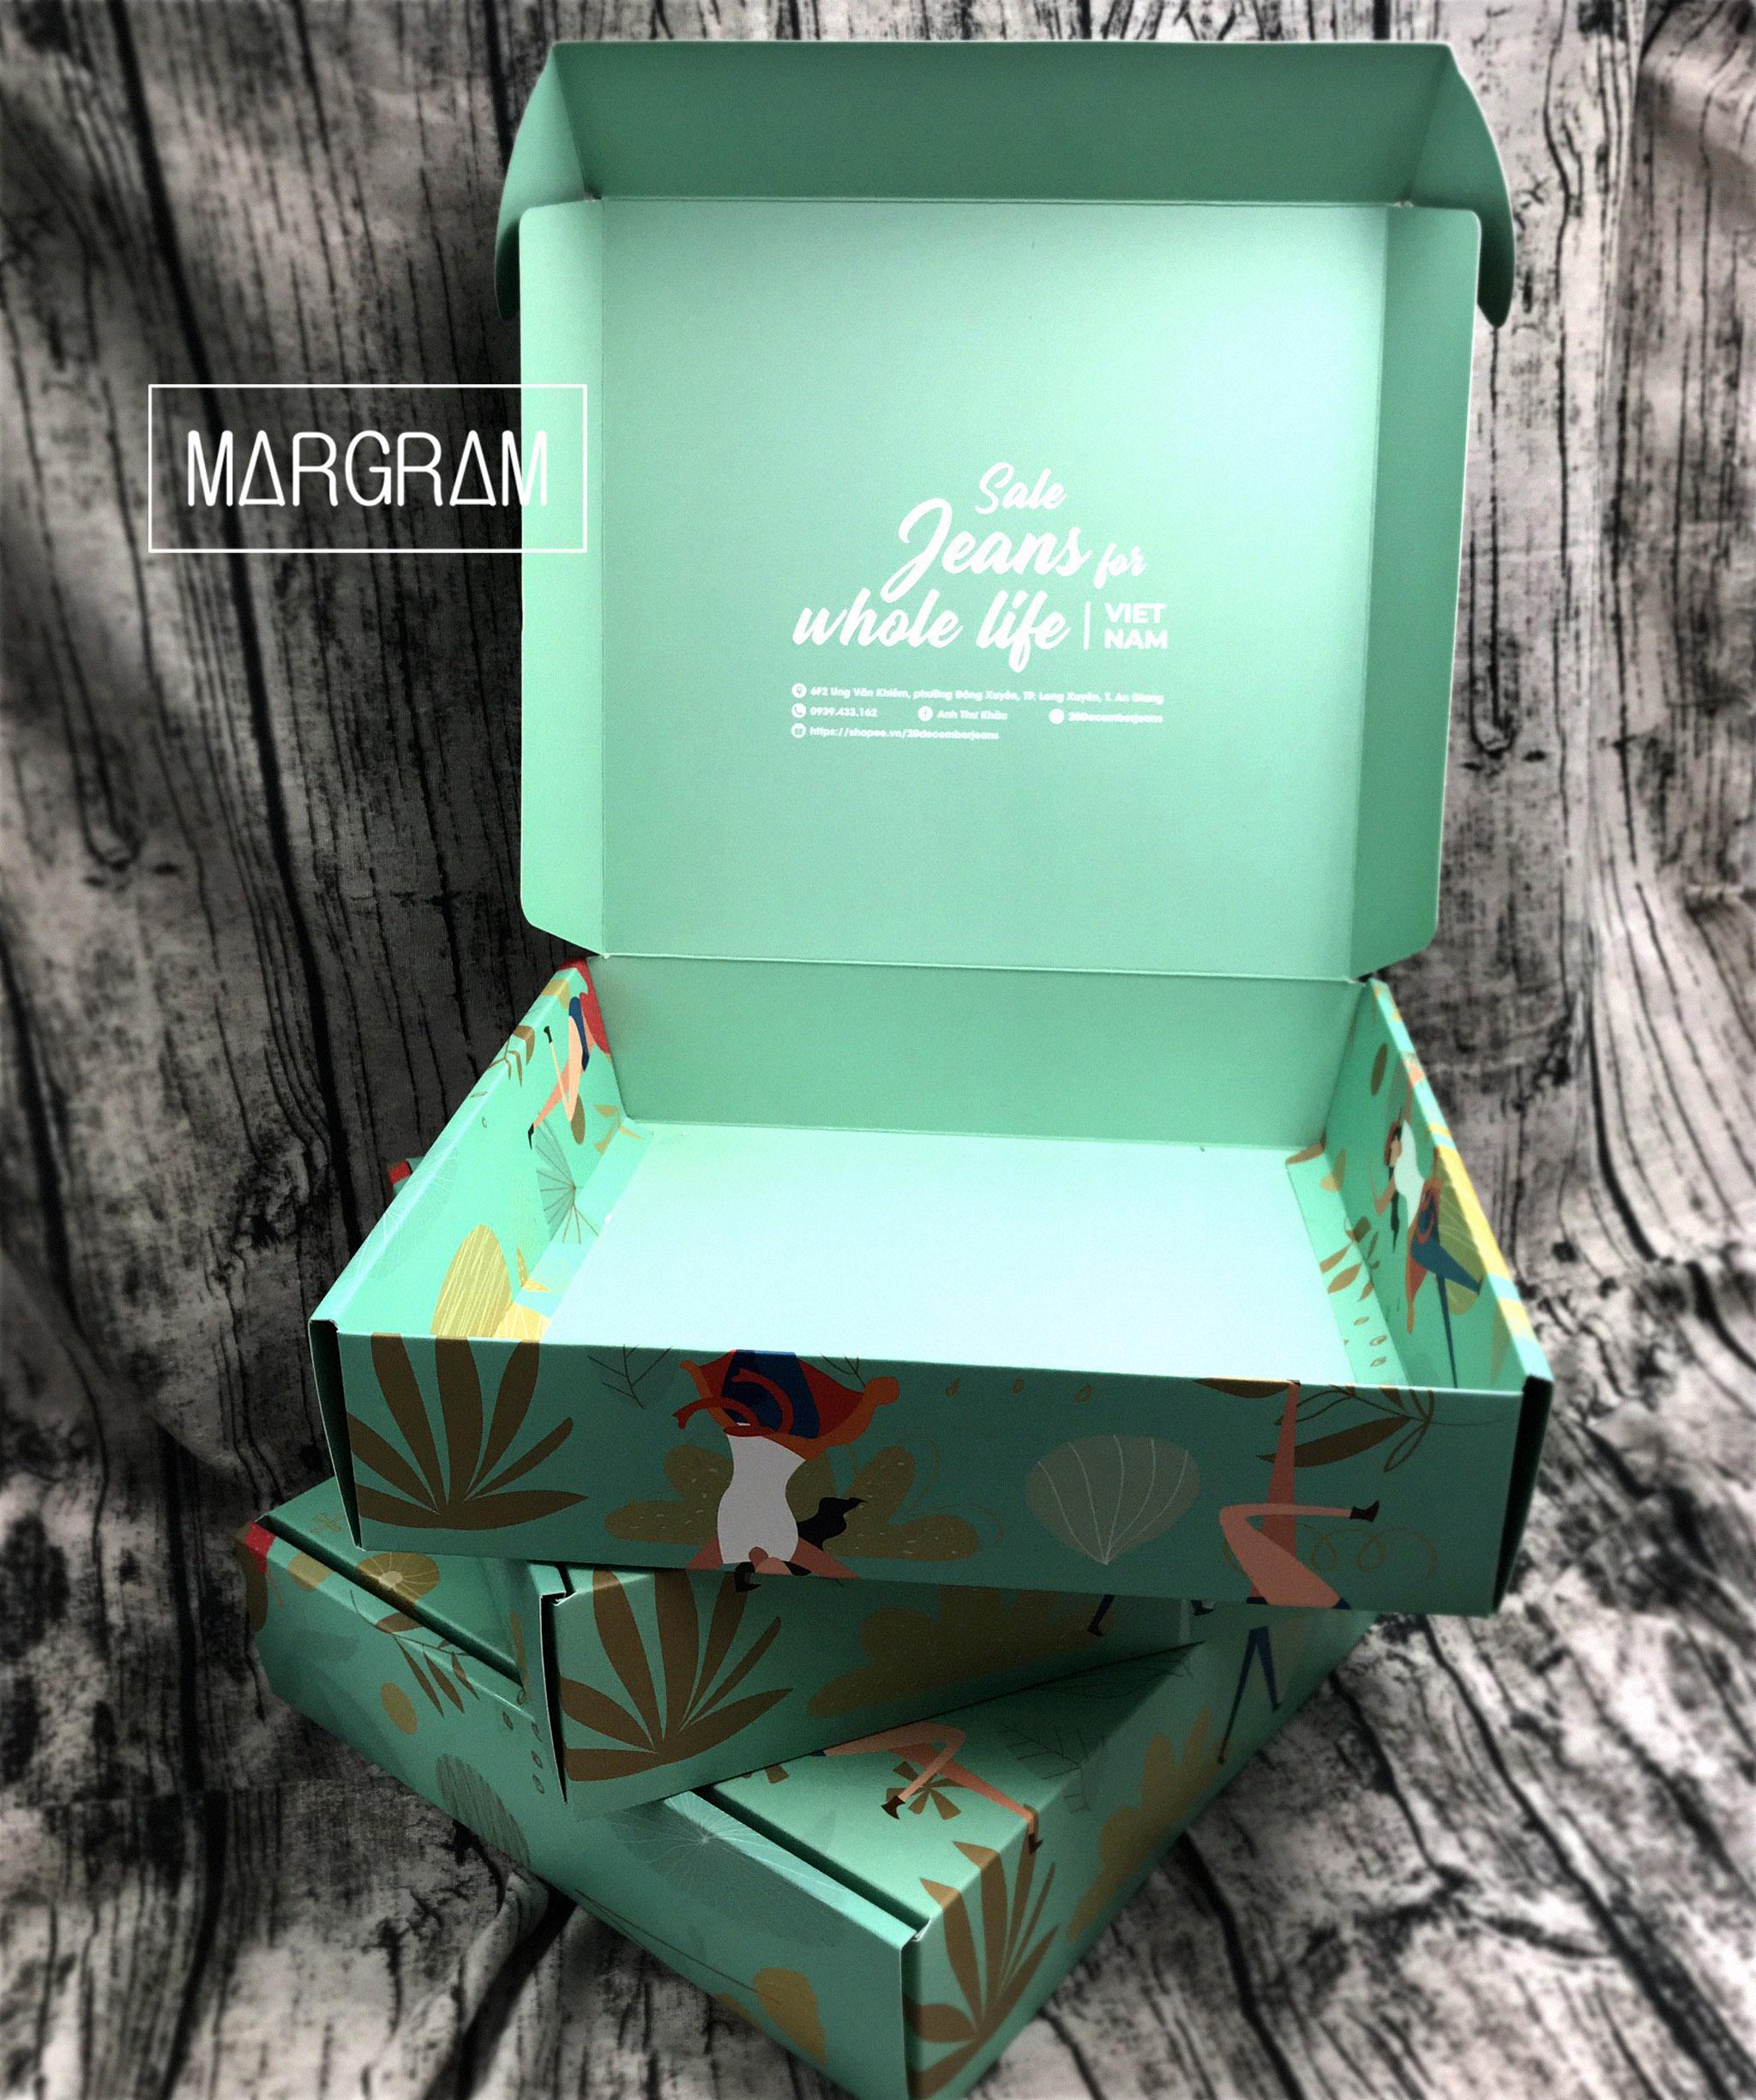 hop-thoi-trang-20-december-jeans-margram-02